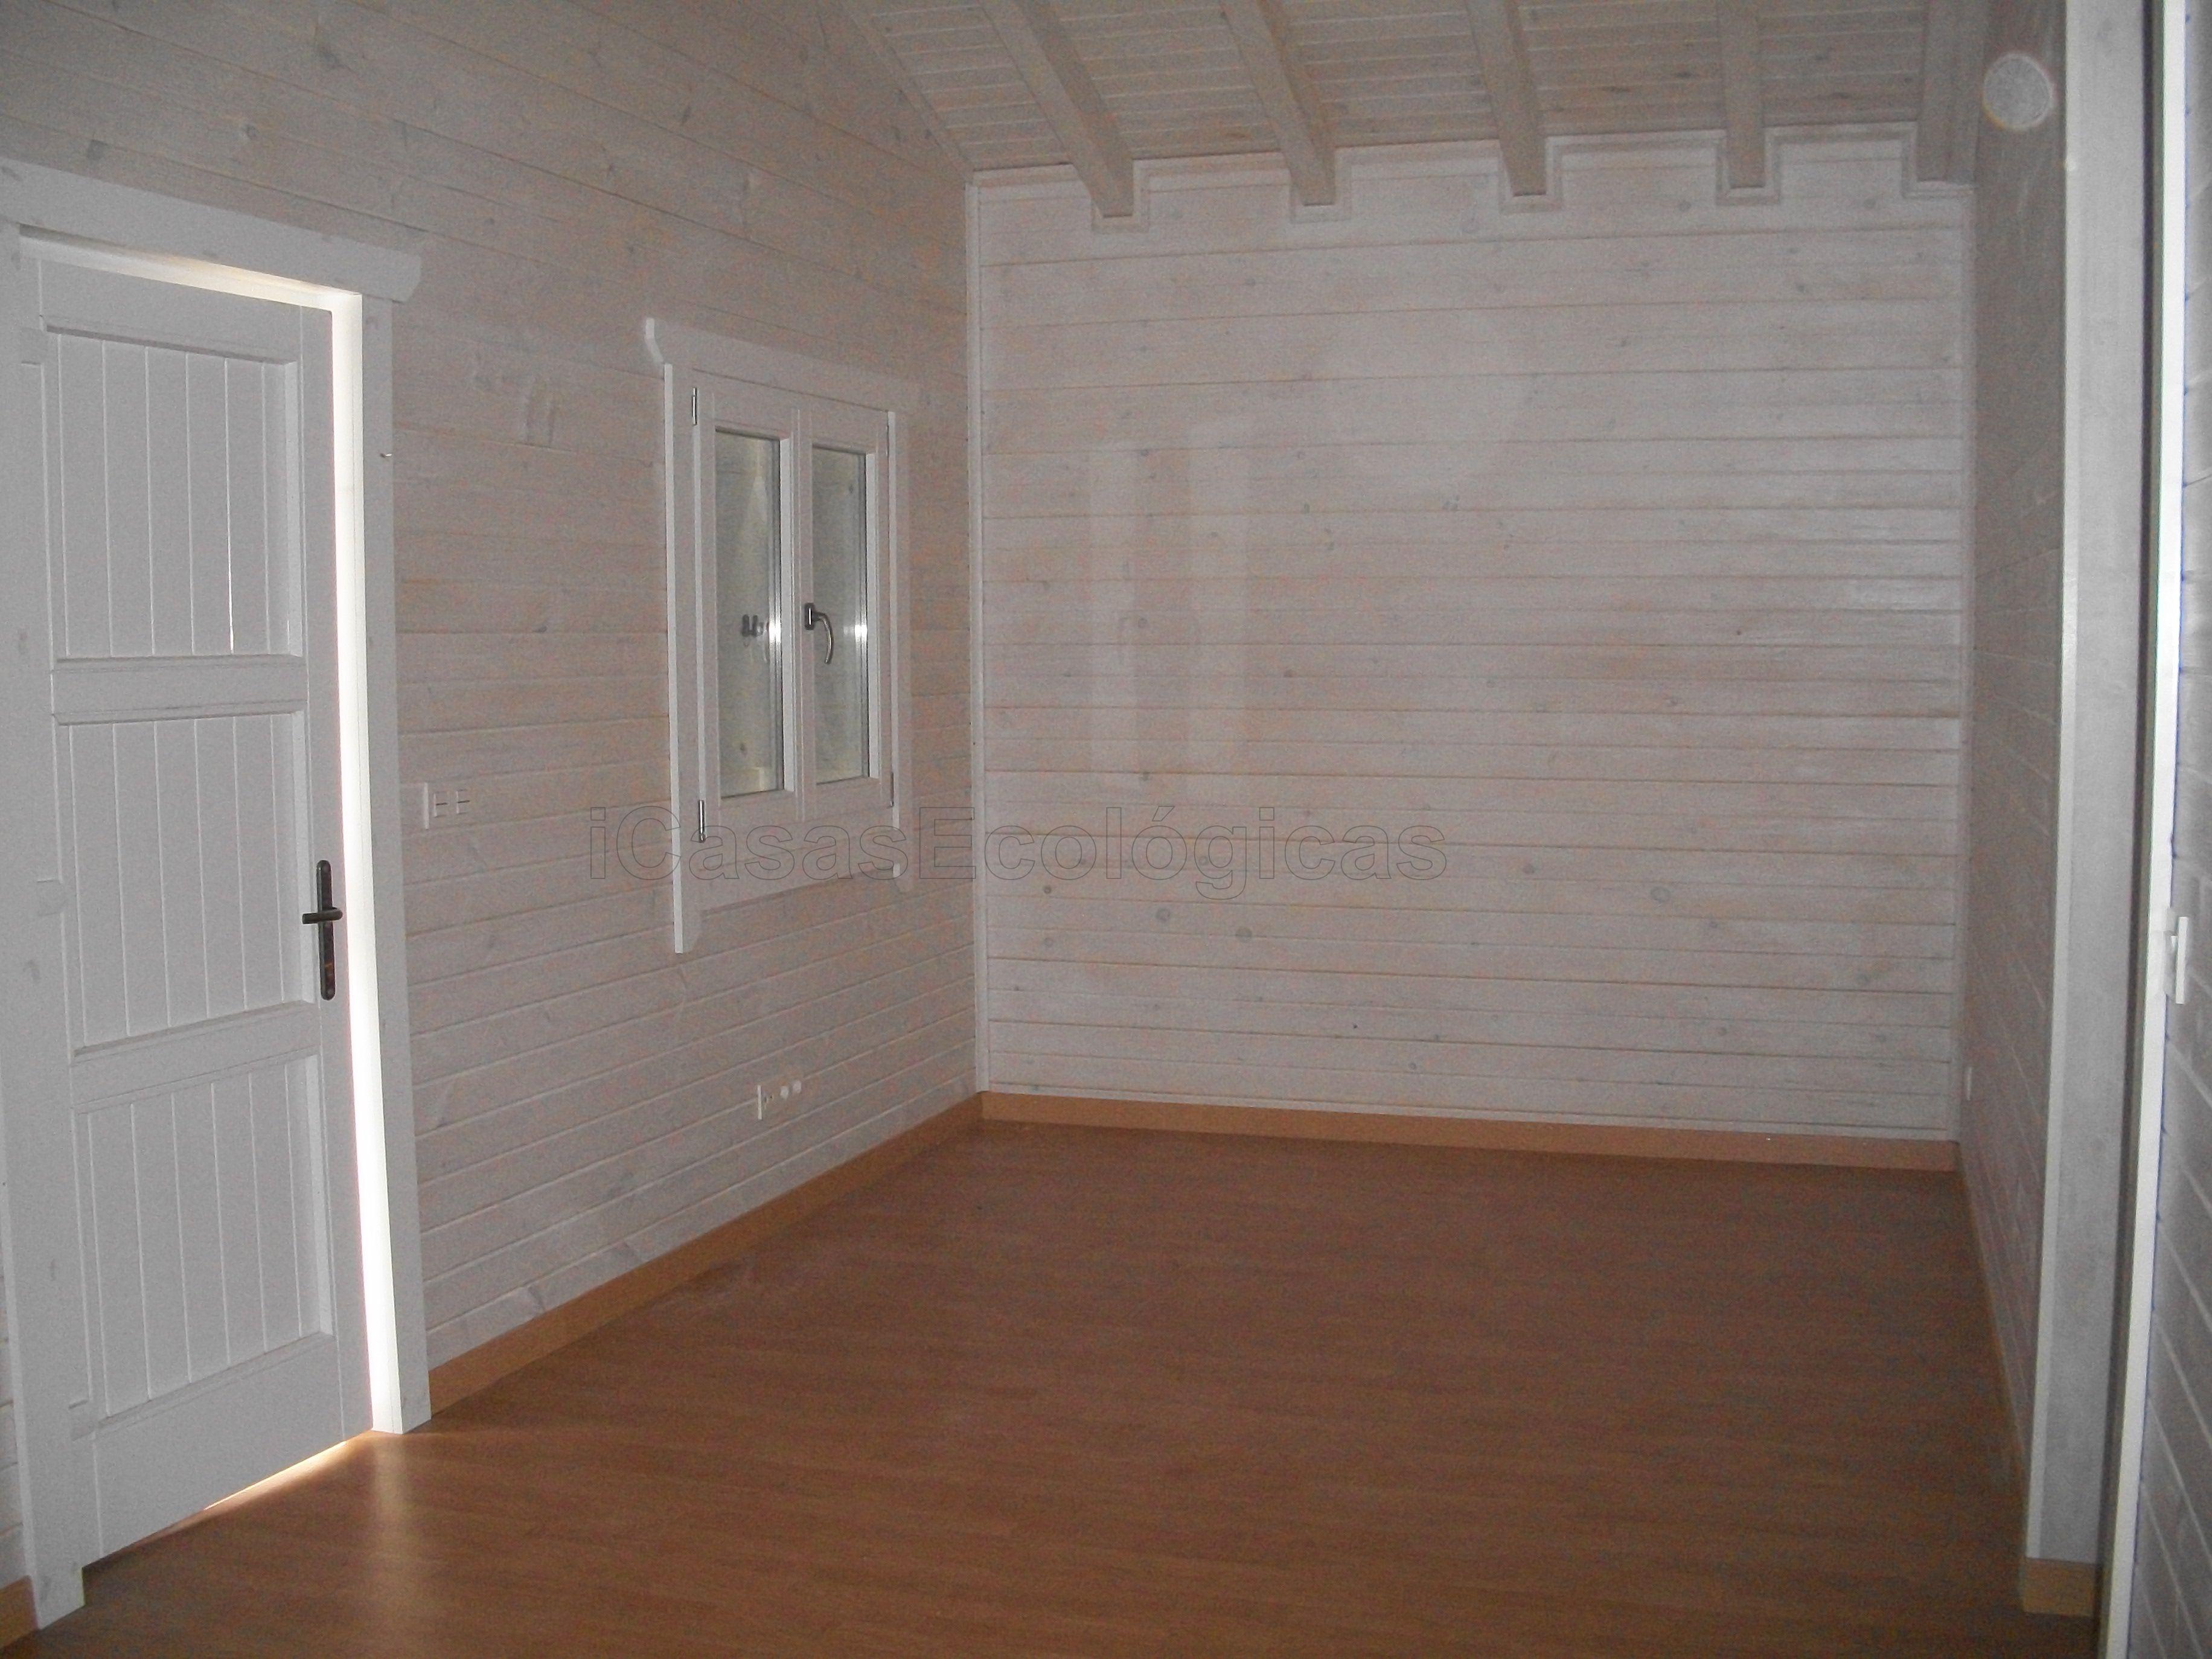 Casa de madera pintada con blanco transl cido por el for Casas pintadas interior